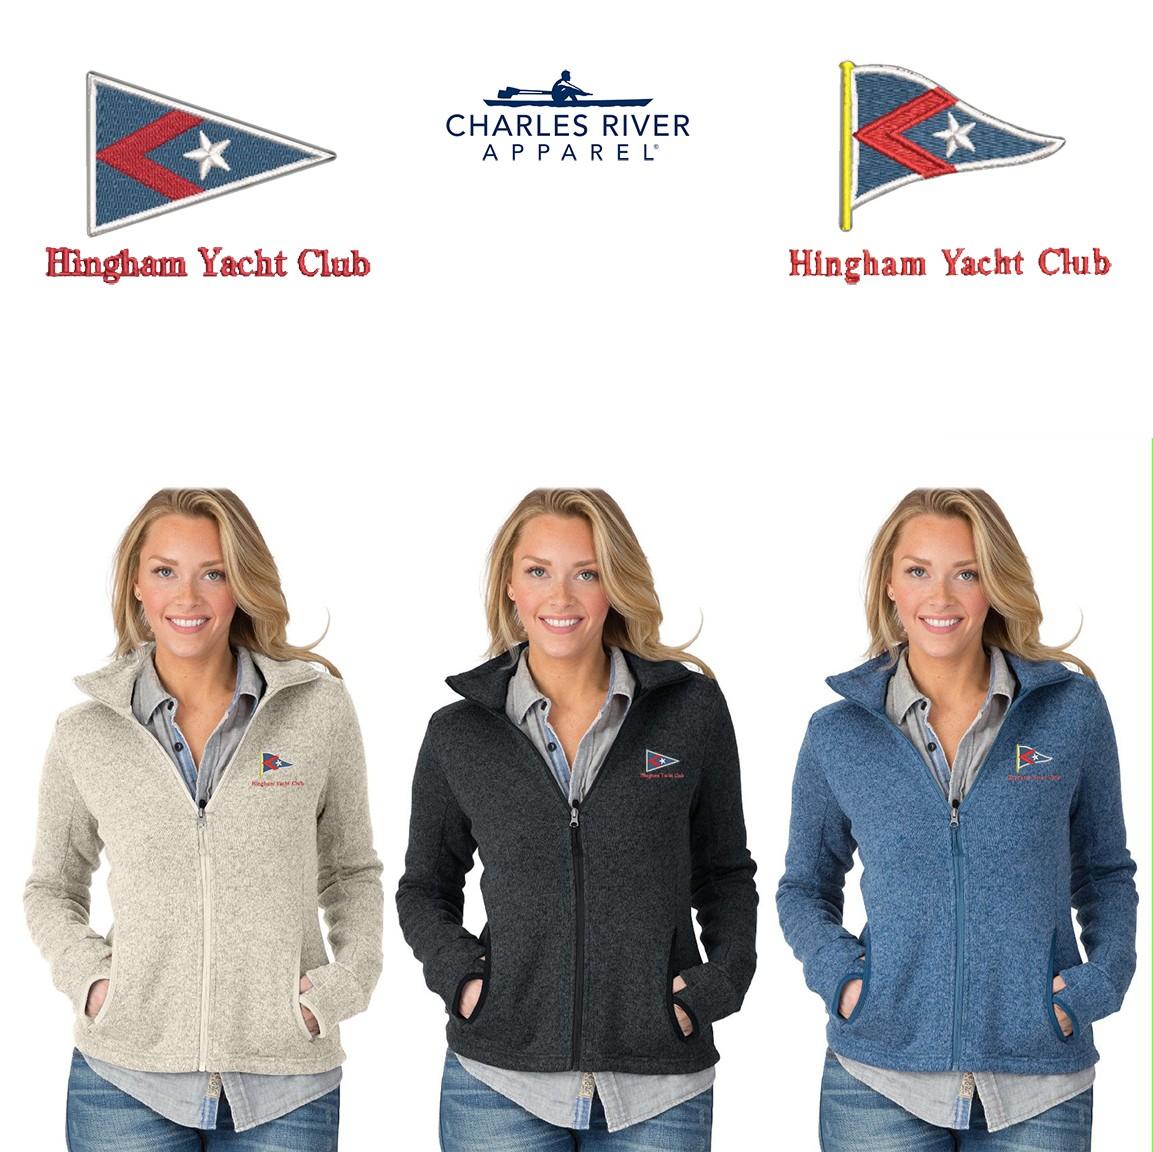 Hingham Yacht Club Charles River Women's Heathered Fleece Jacket 5493